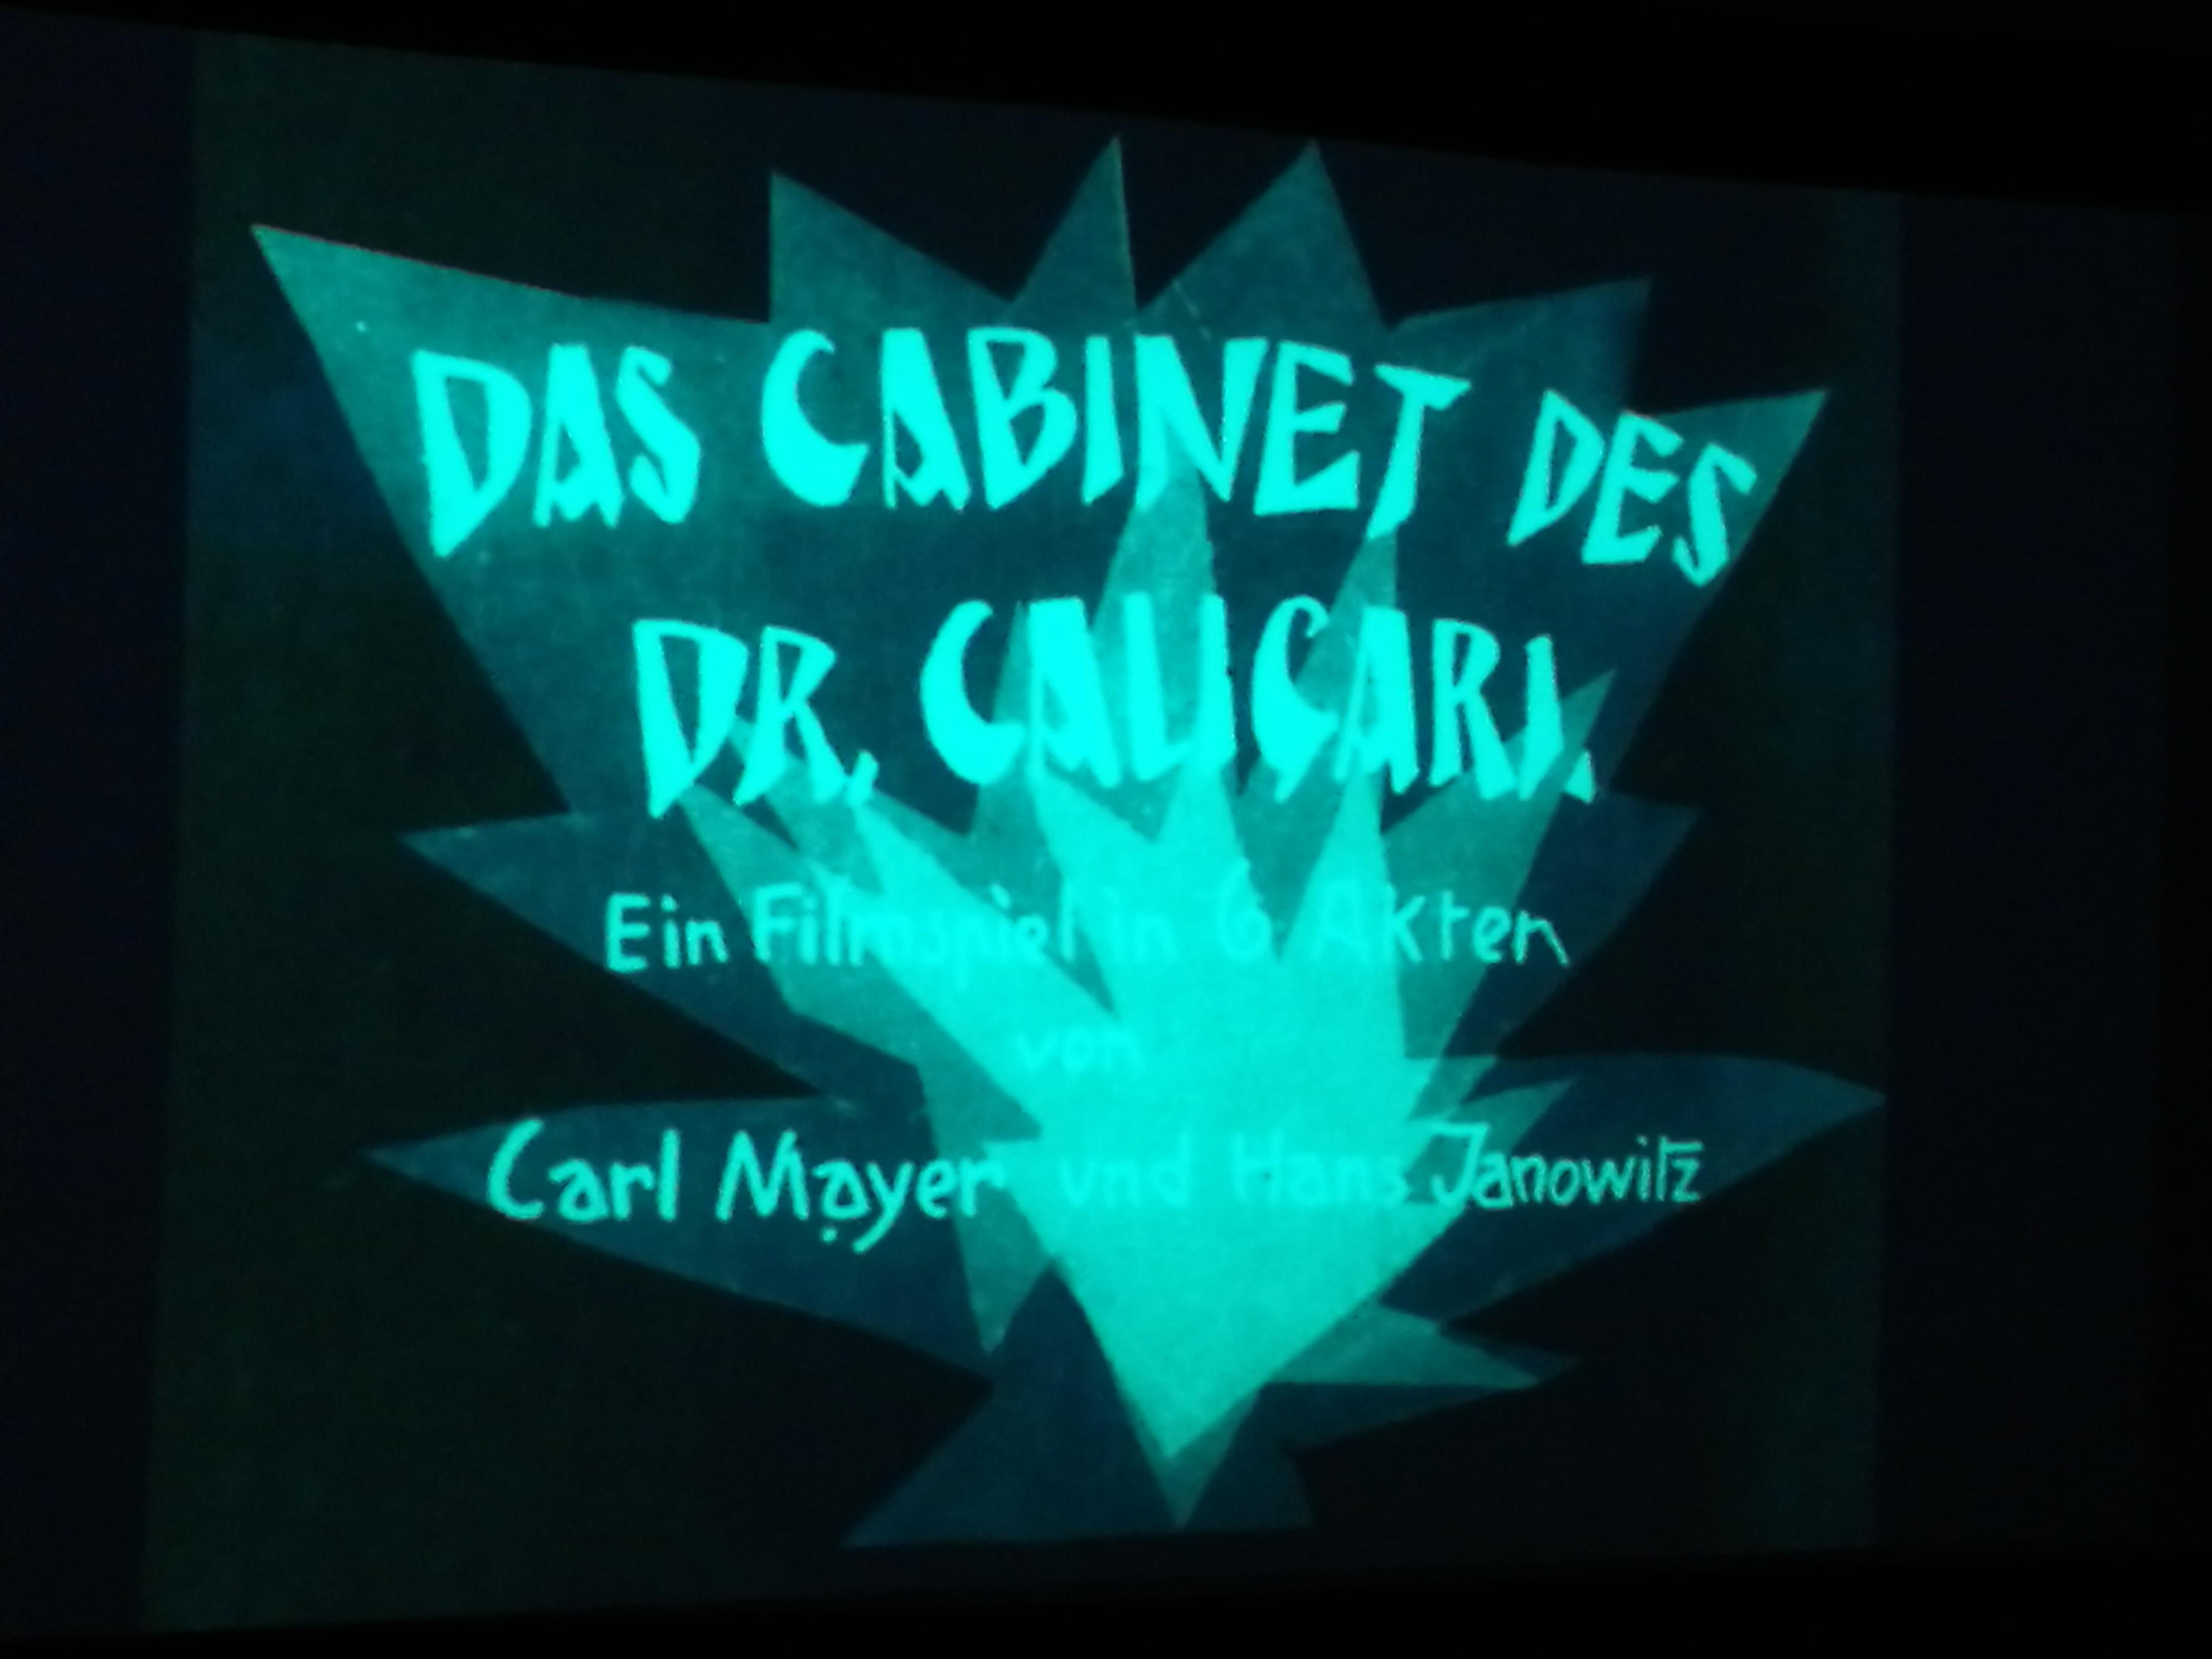 Titelschrift Dr. Caligari